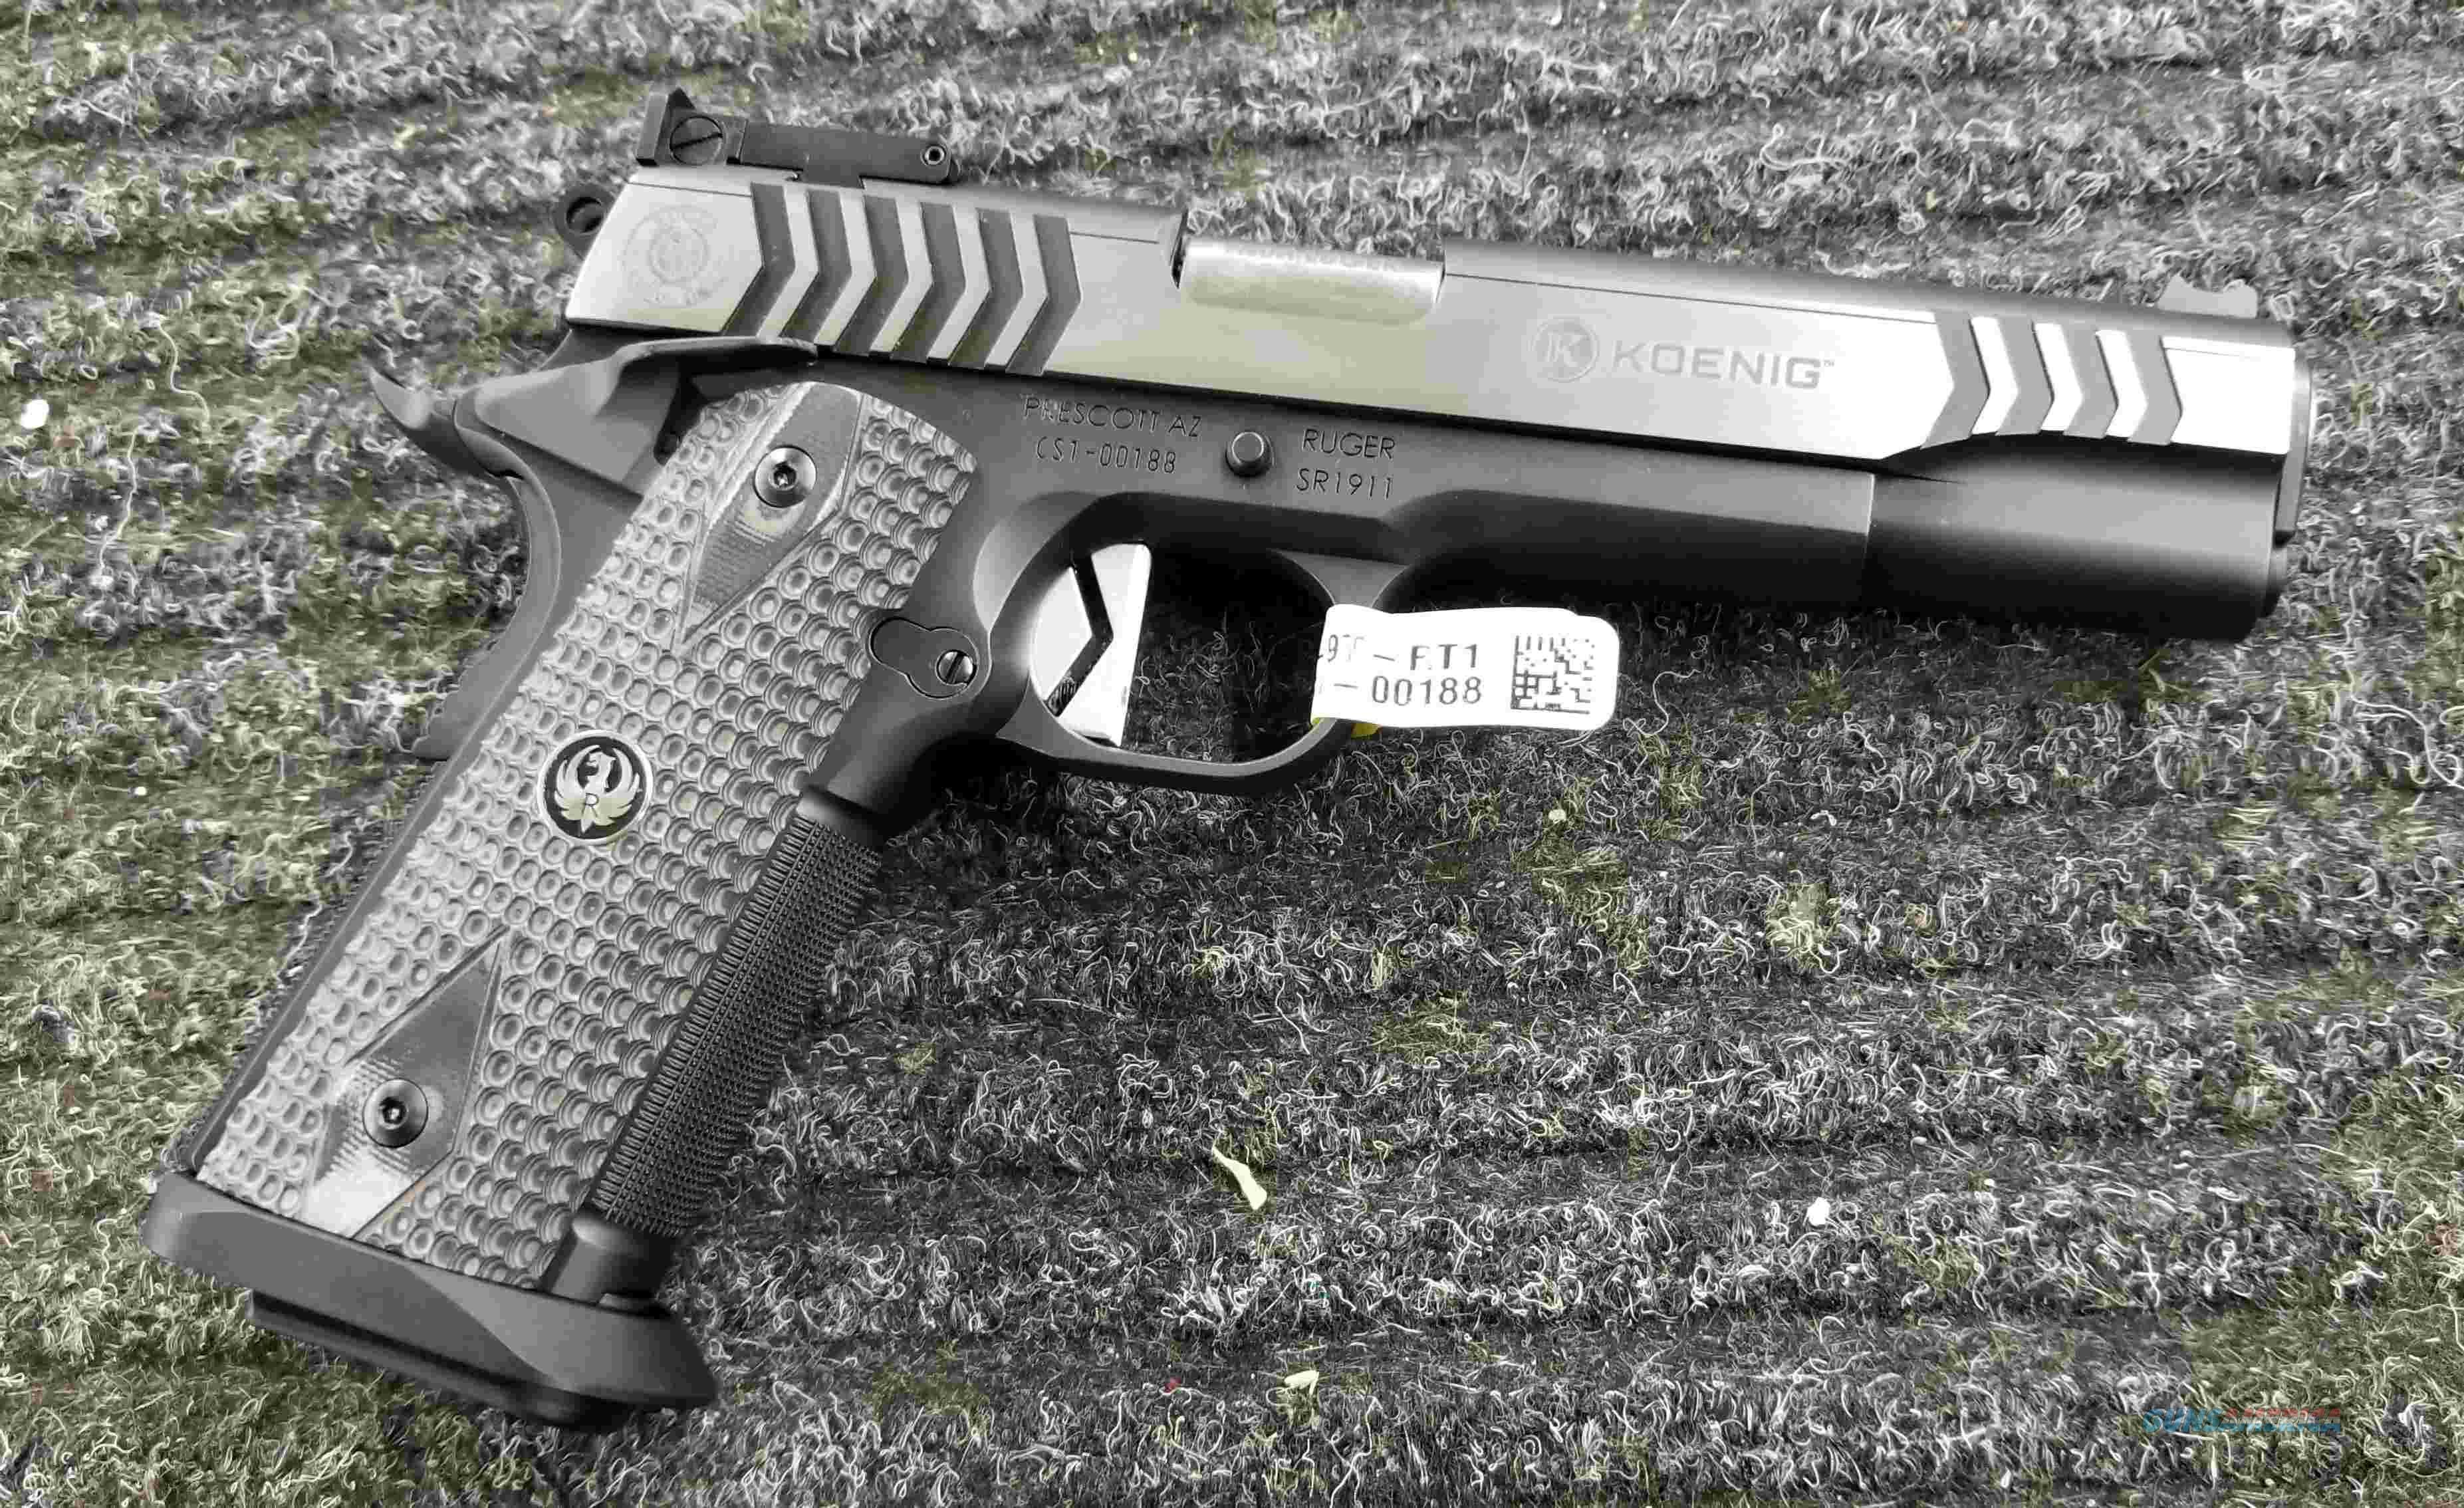 Ruger Custom Shop SR1911 - 9mm - Doug Koenig Special - Free Shipping !!!